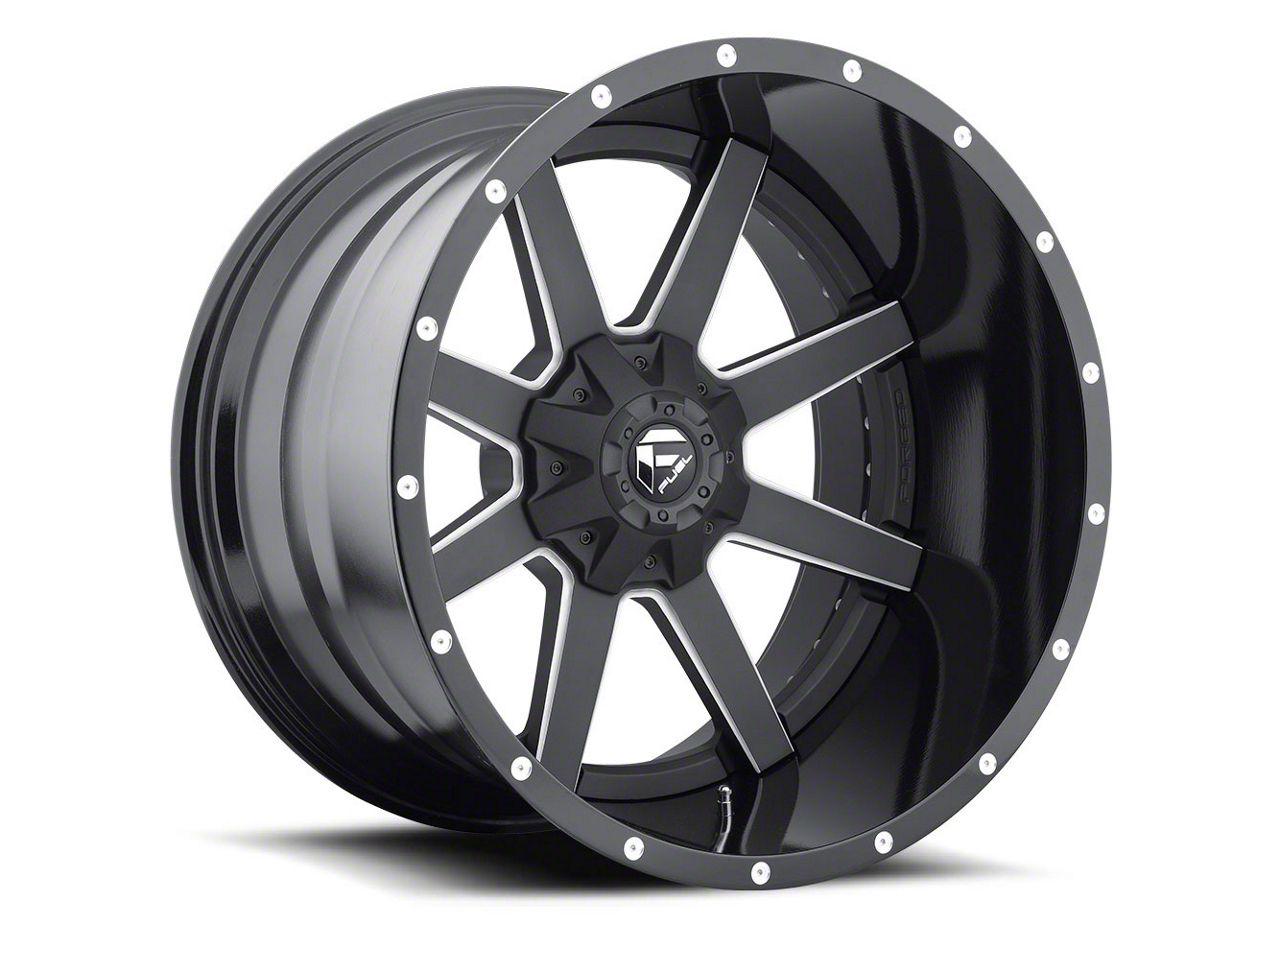 Fuel Wheels Maverick 2-Piece Black Milled 6-Lug Wheel - 20x12 (99-18 Silverado 1500)